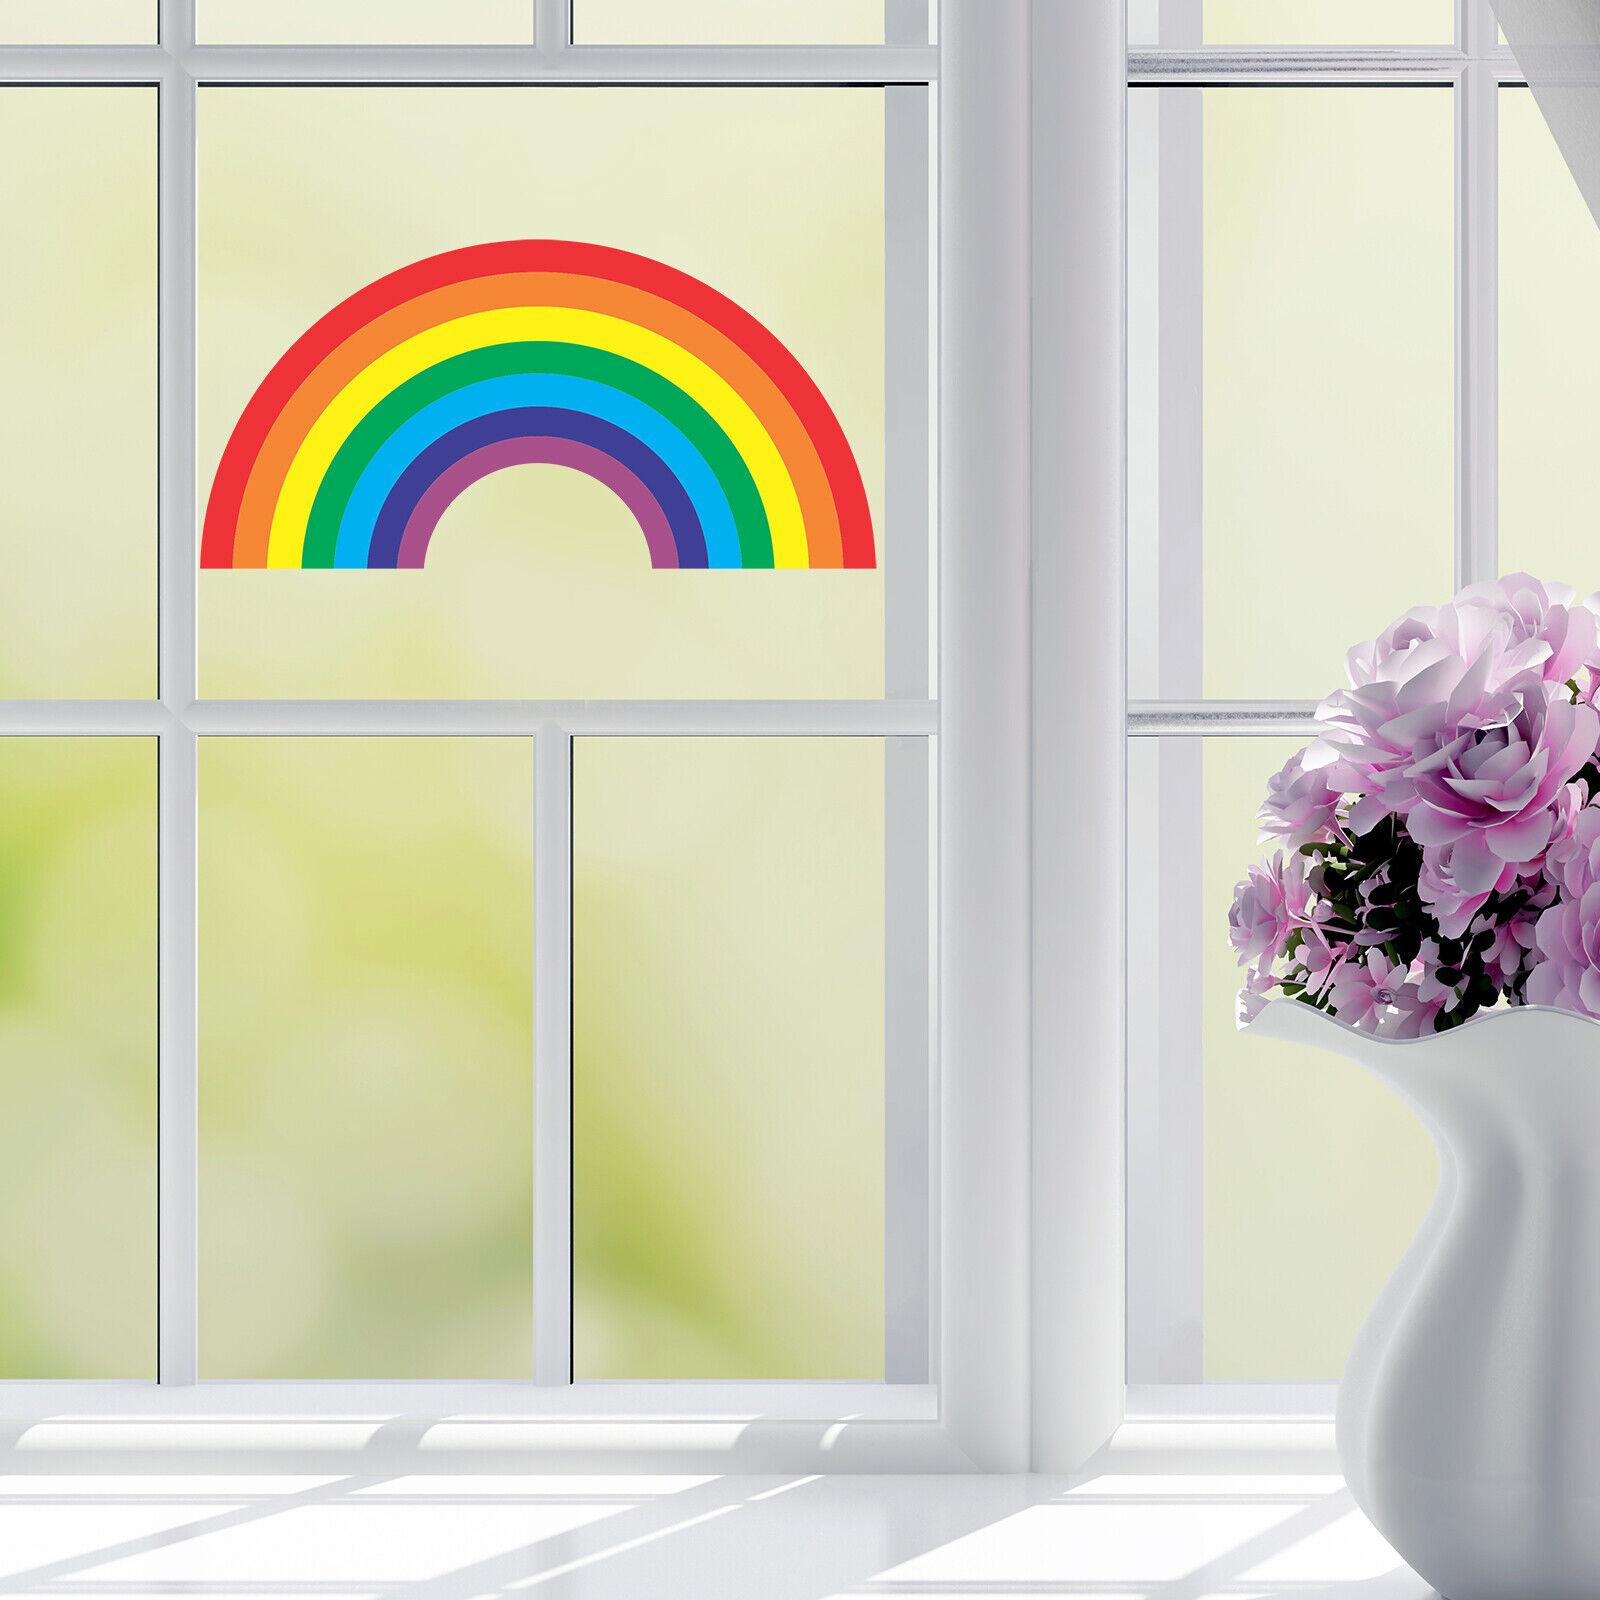 Home Decoration - Rainbow of Hope in Isolation Quarantine Window Sticker Unity Faith Trust - 2 PCS